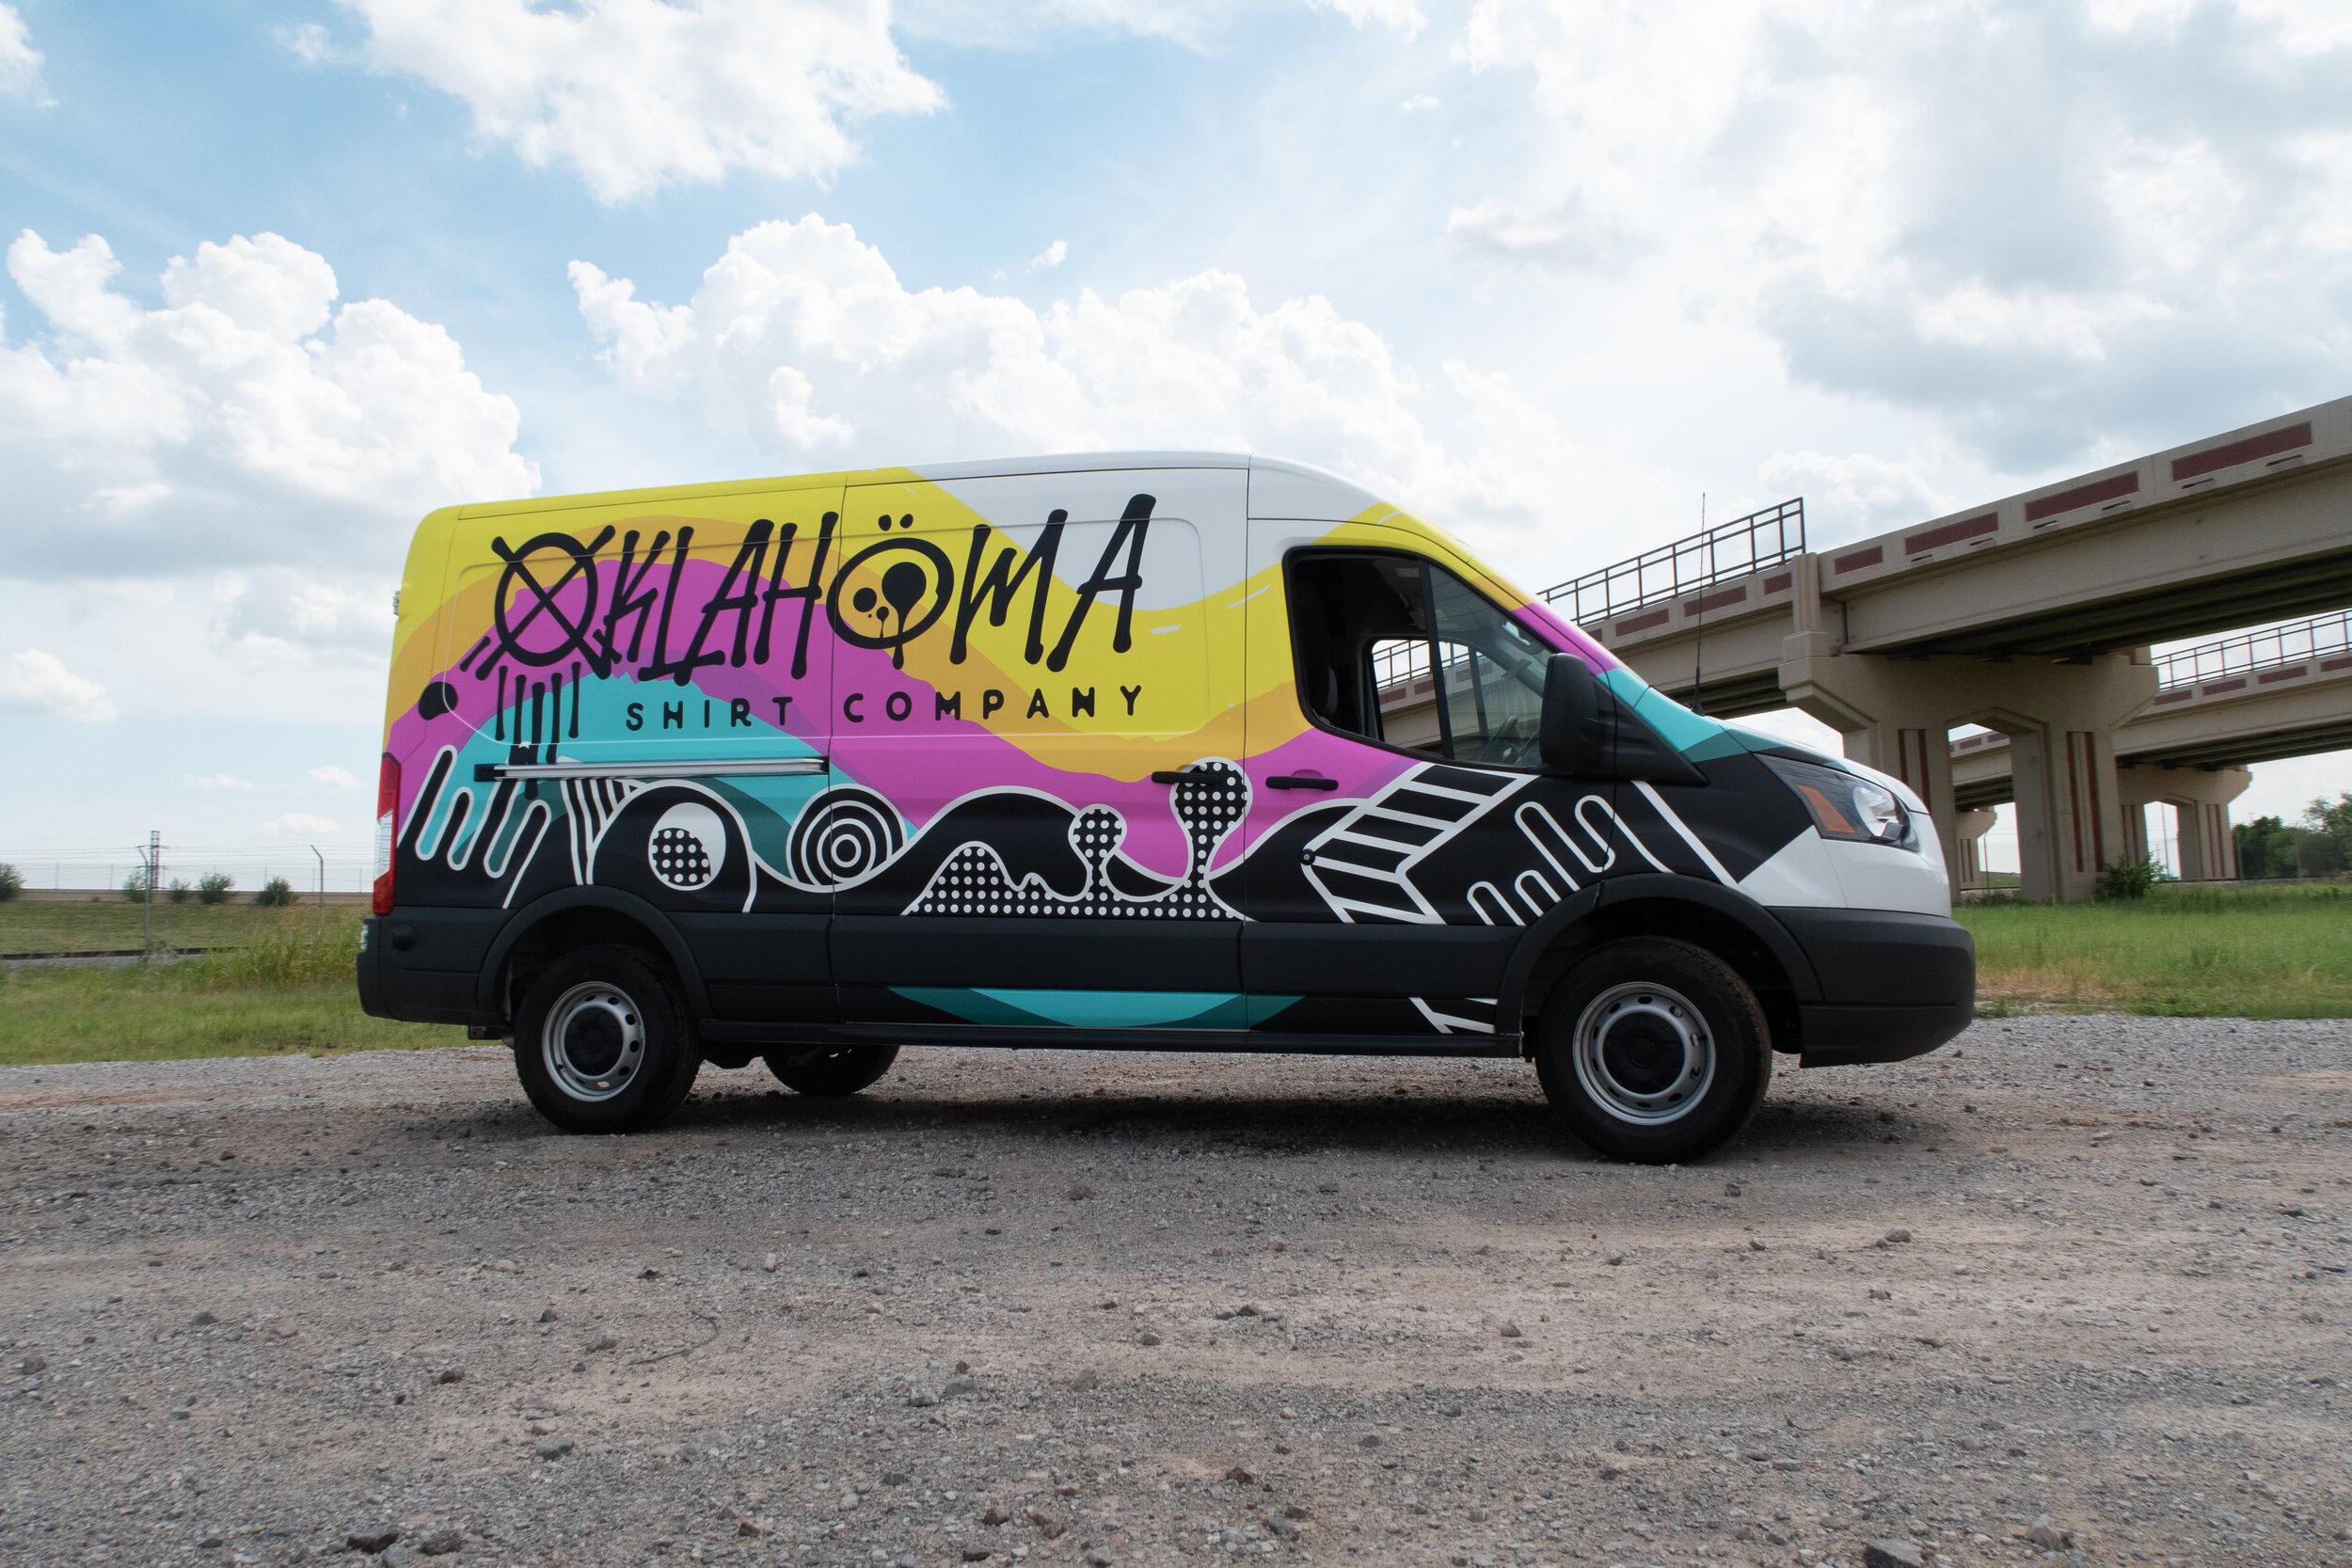 Oklahoma Shirt Company commercial van wrap (2).jpg